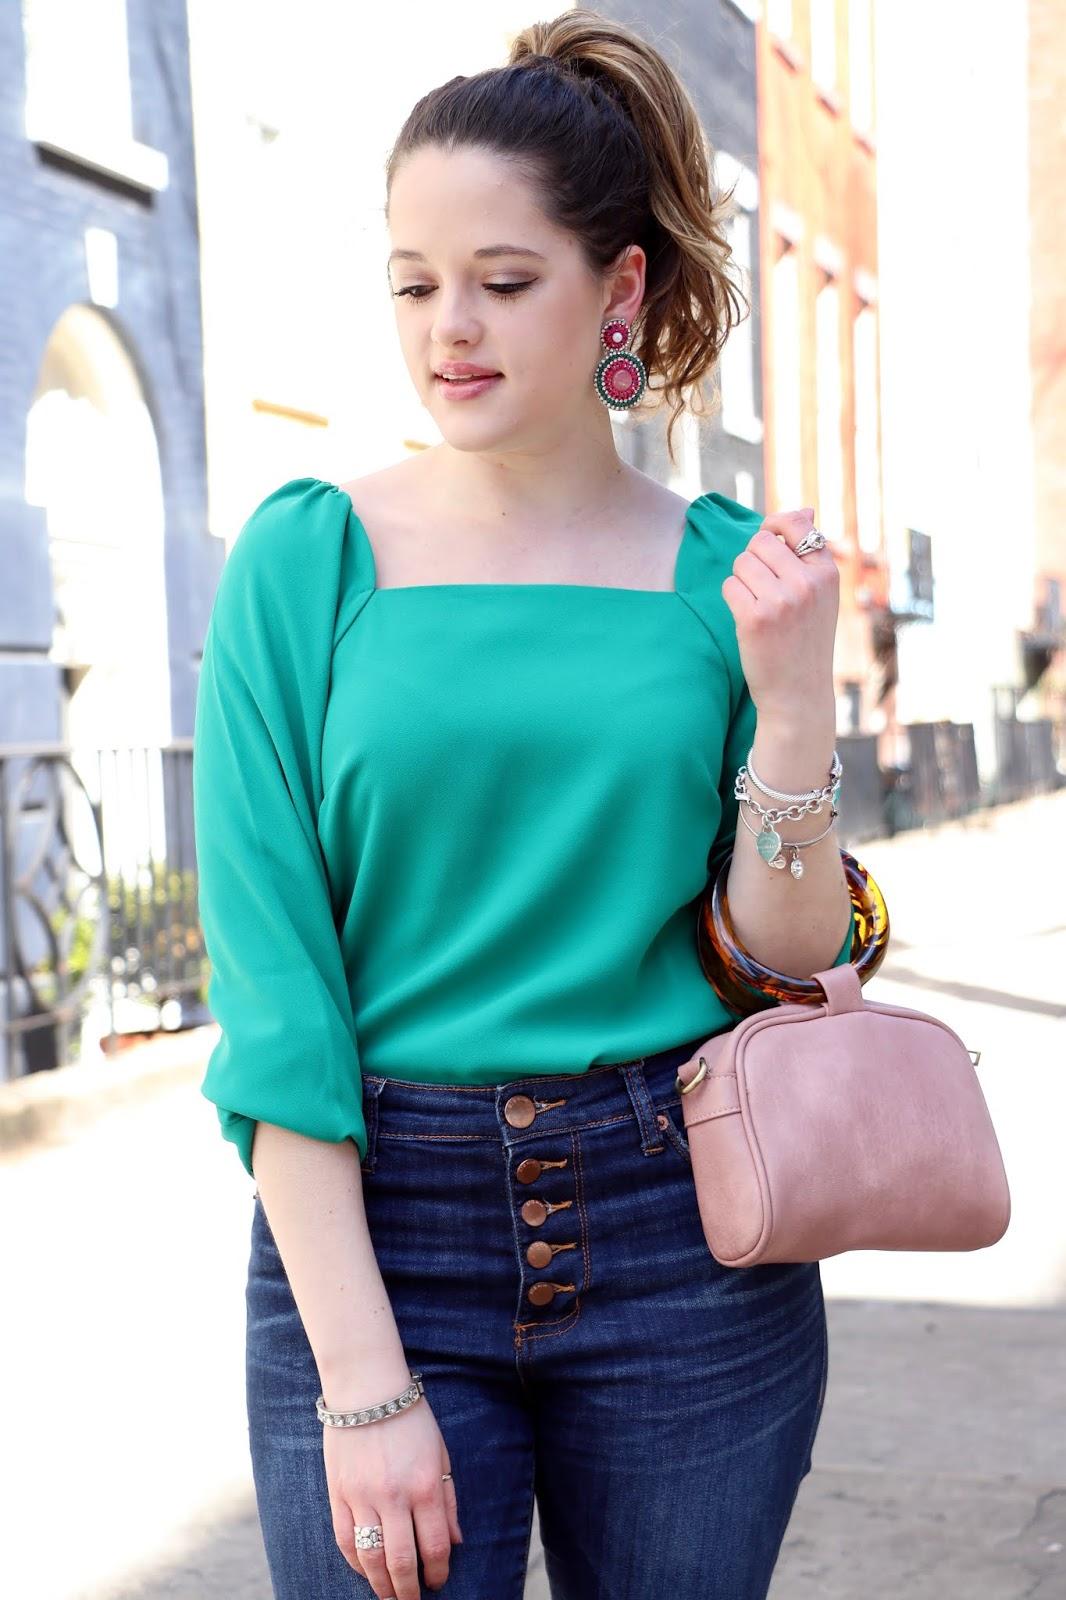 Nyc fashion blogger Kathleen Harper wearing a square neckline top